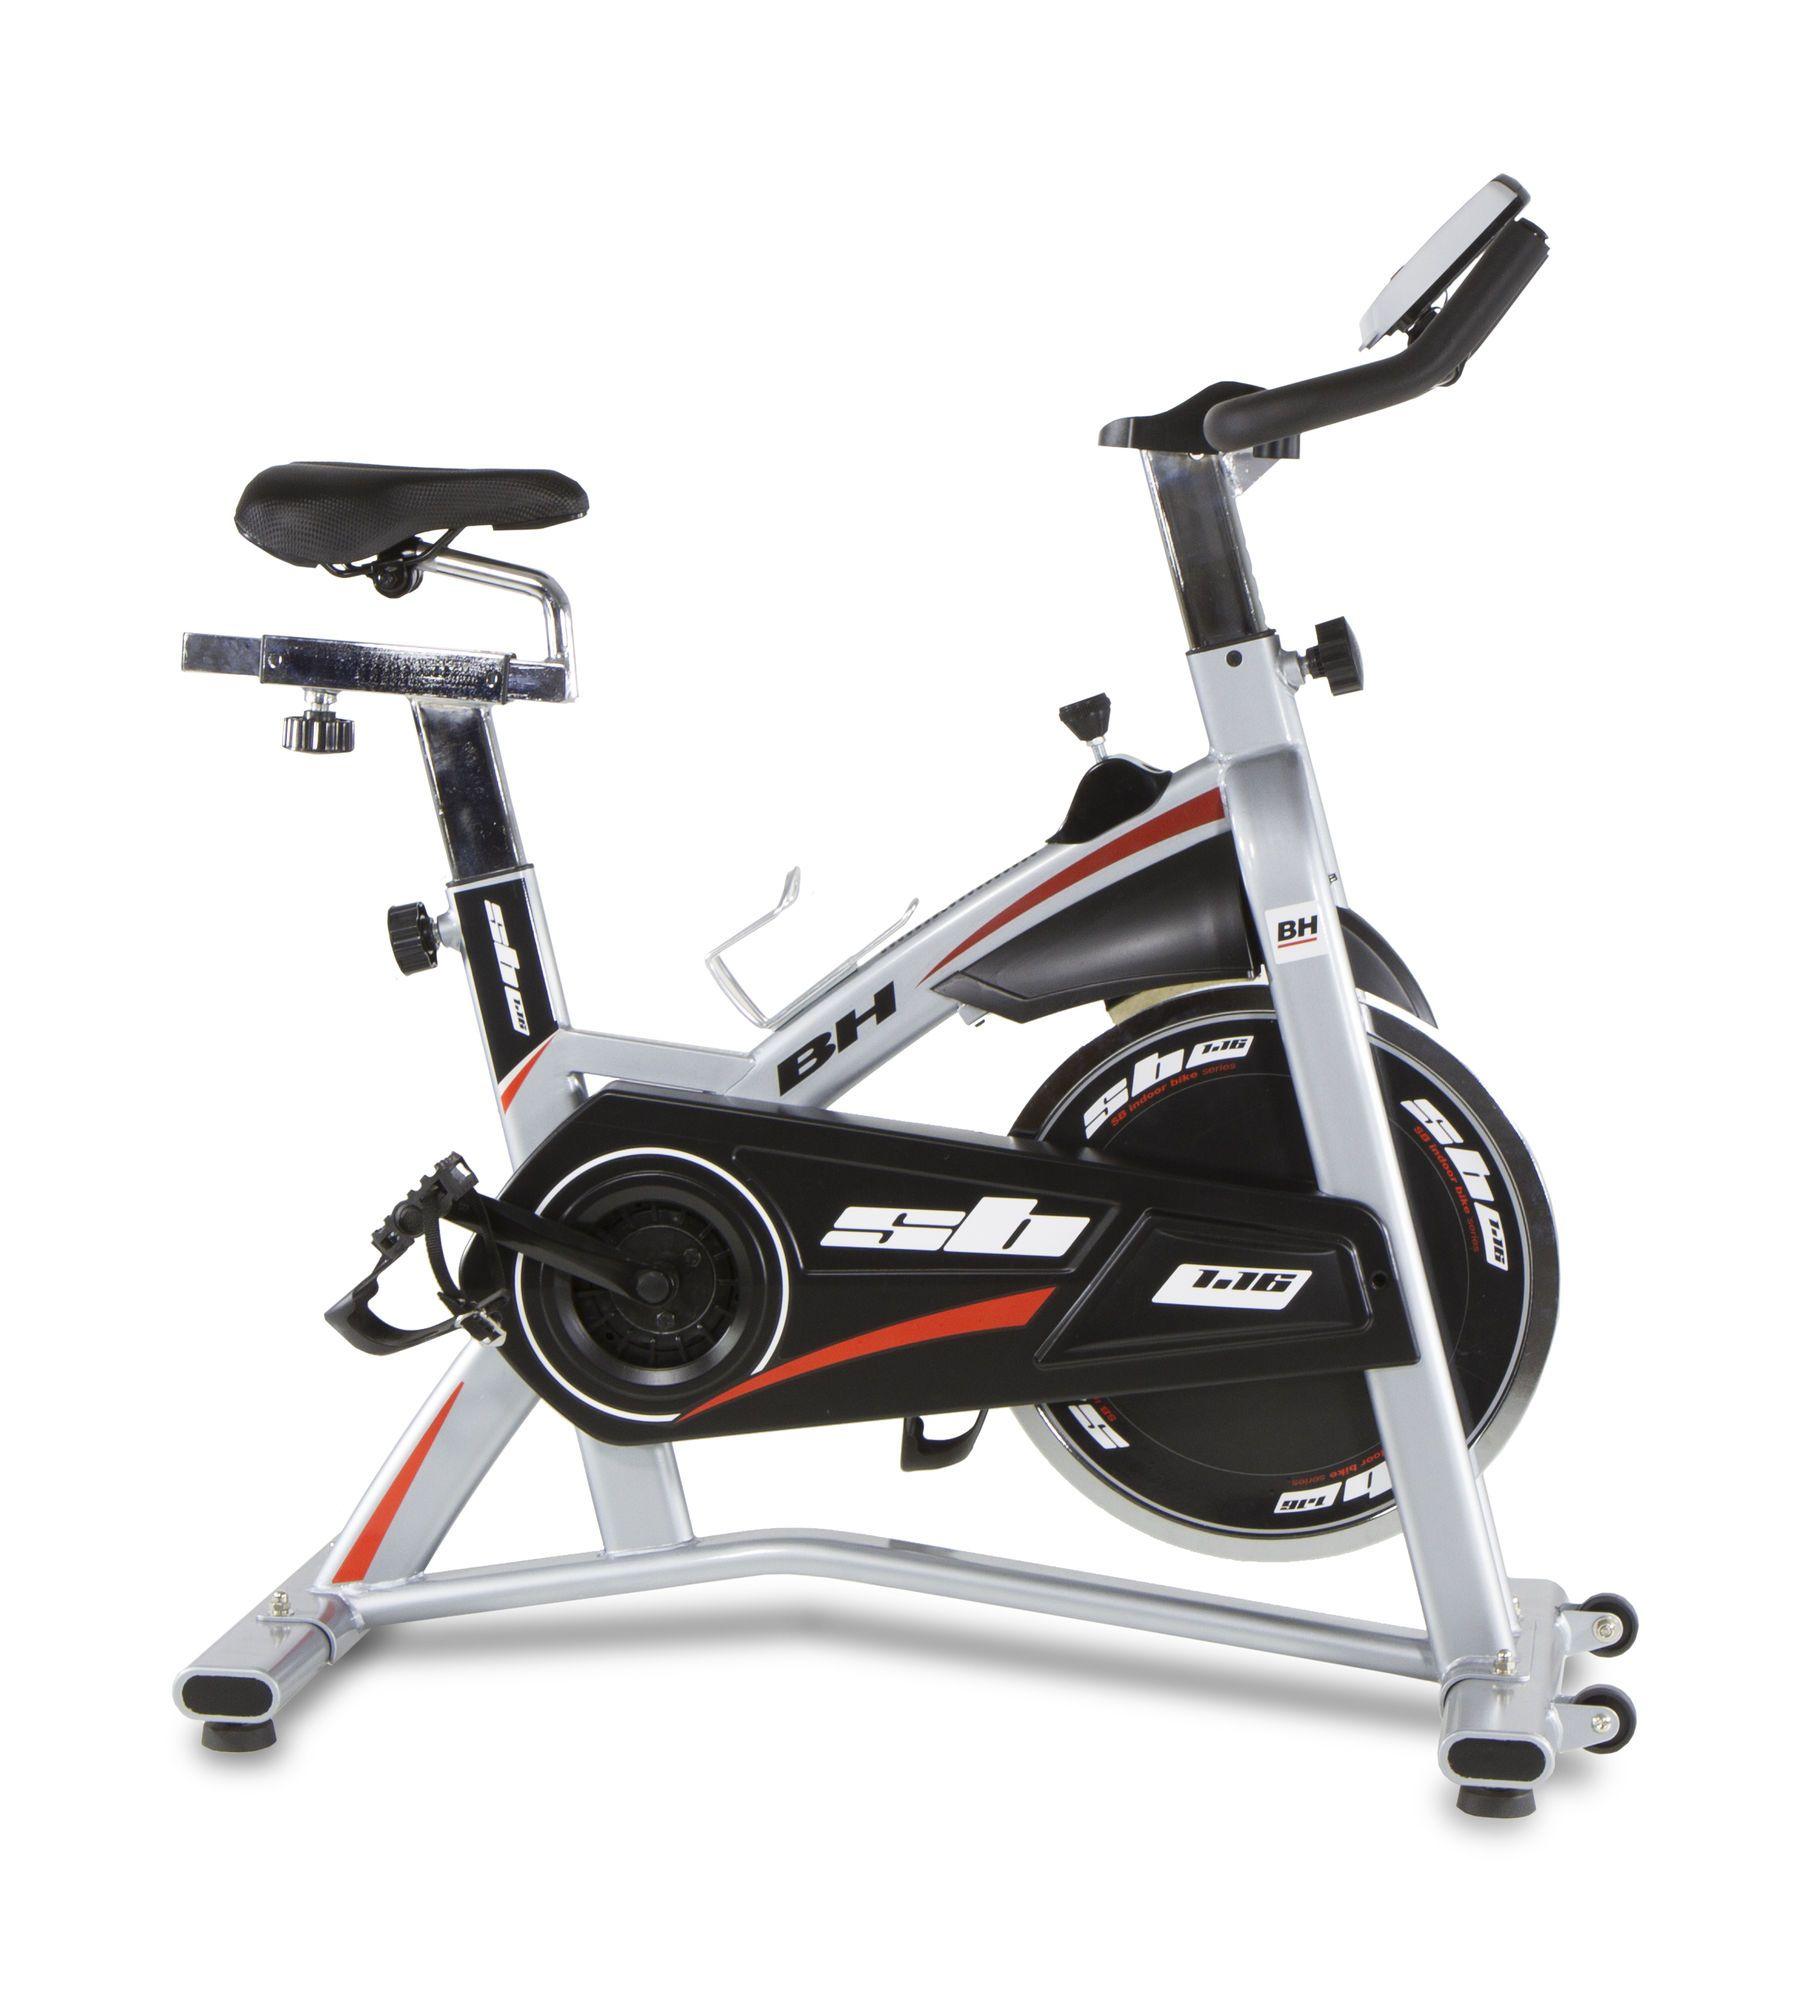 Afbeelding van BH Fitness Spinning bike SB1.16 met smartphone houder